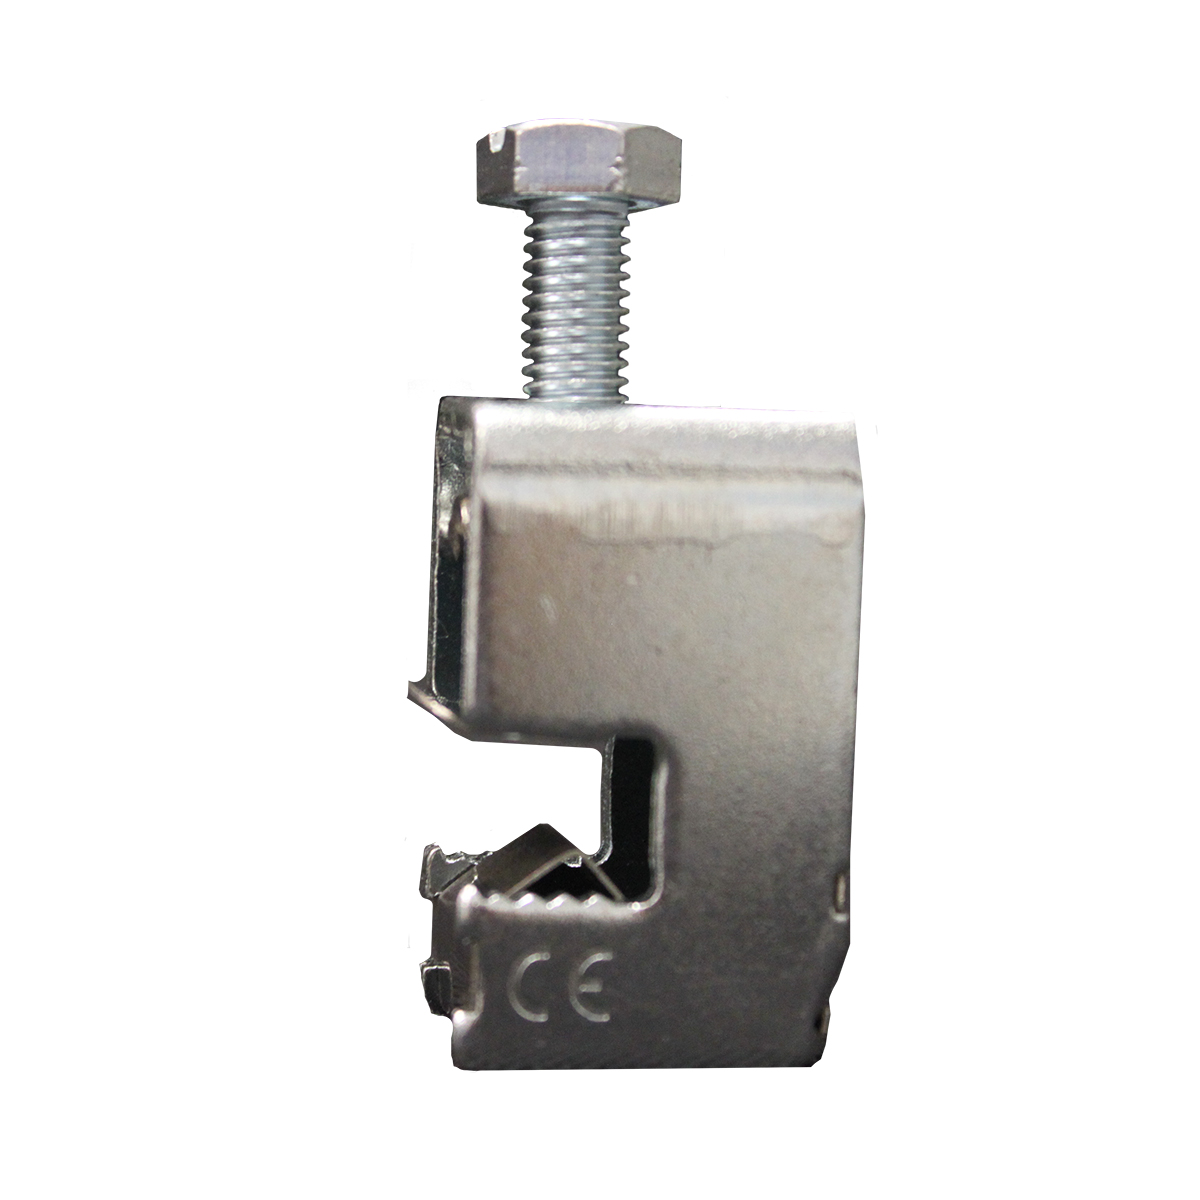 1 Stk Alu-Kupfer-Leiteranschlußklemme 50 -185mm² / 5mm² IS5051805-